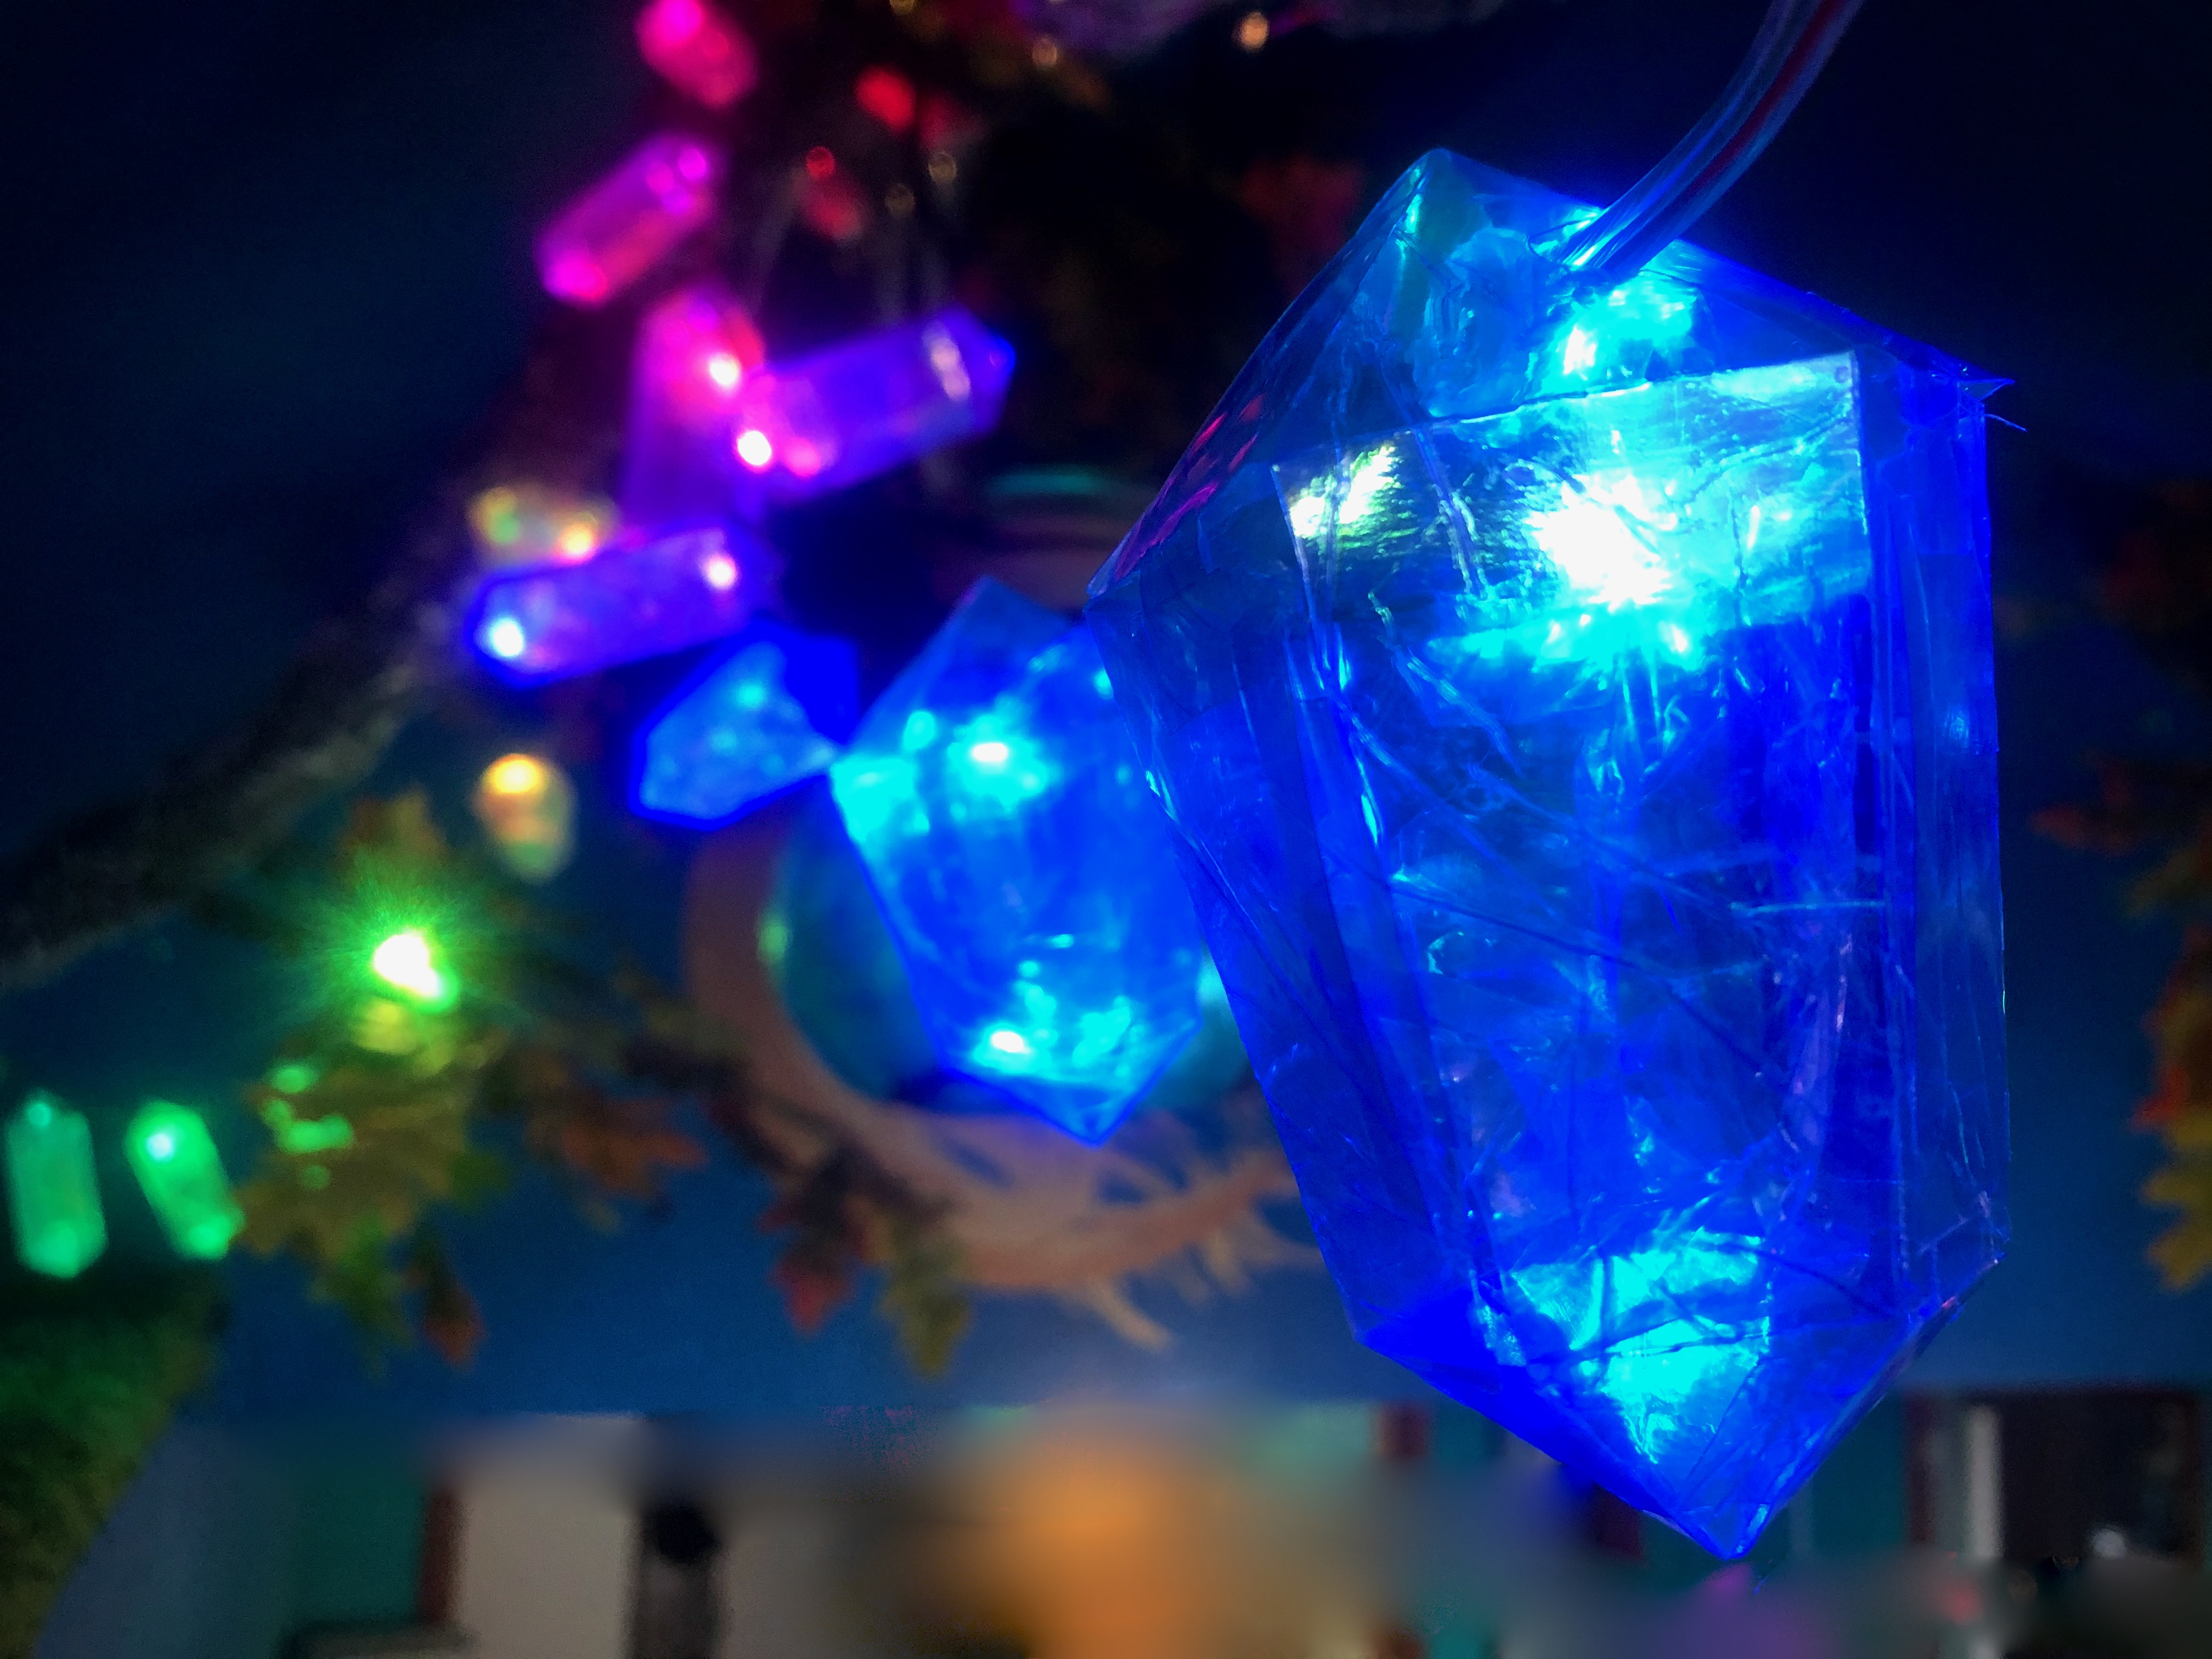 led_pixels_crystals_foreground.jpeg